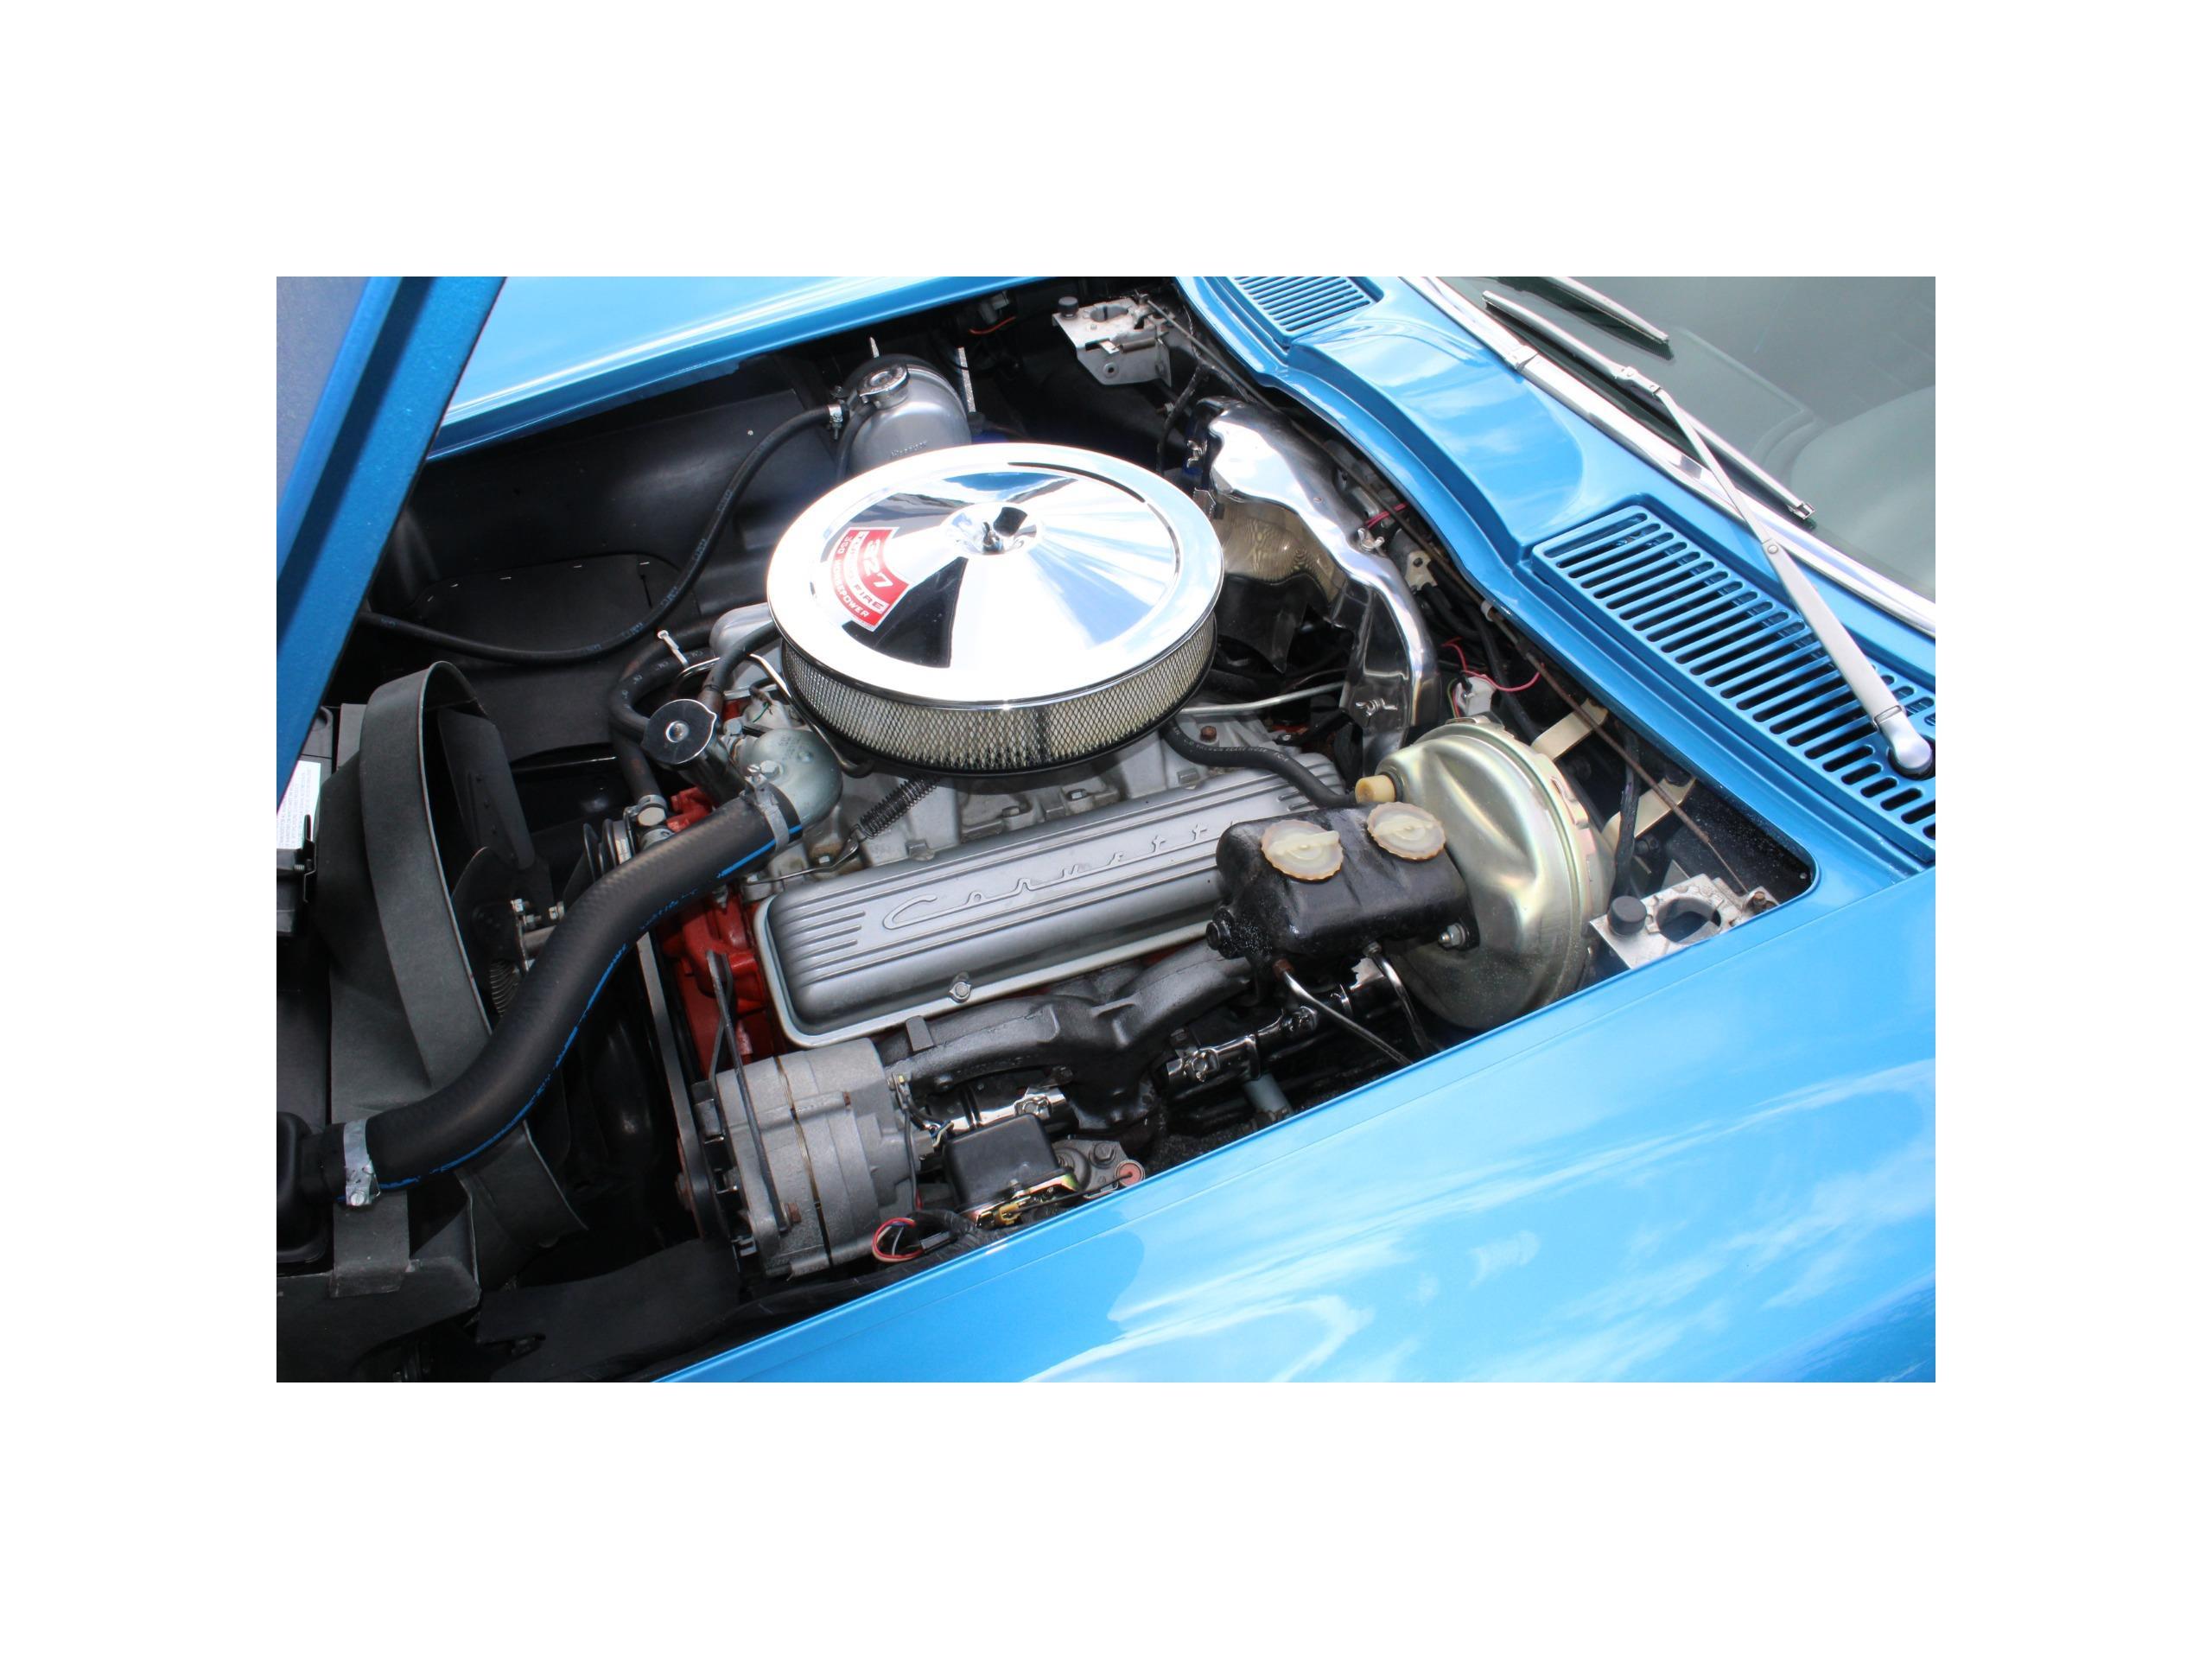 1966 Chevrolet Corvette for Sale ClassicCars